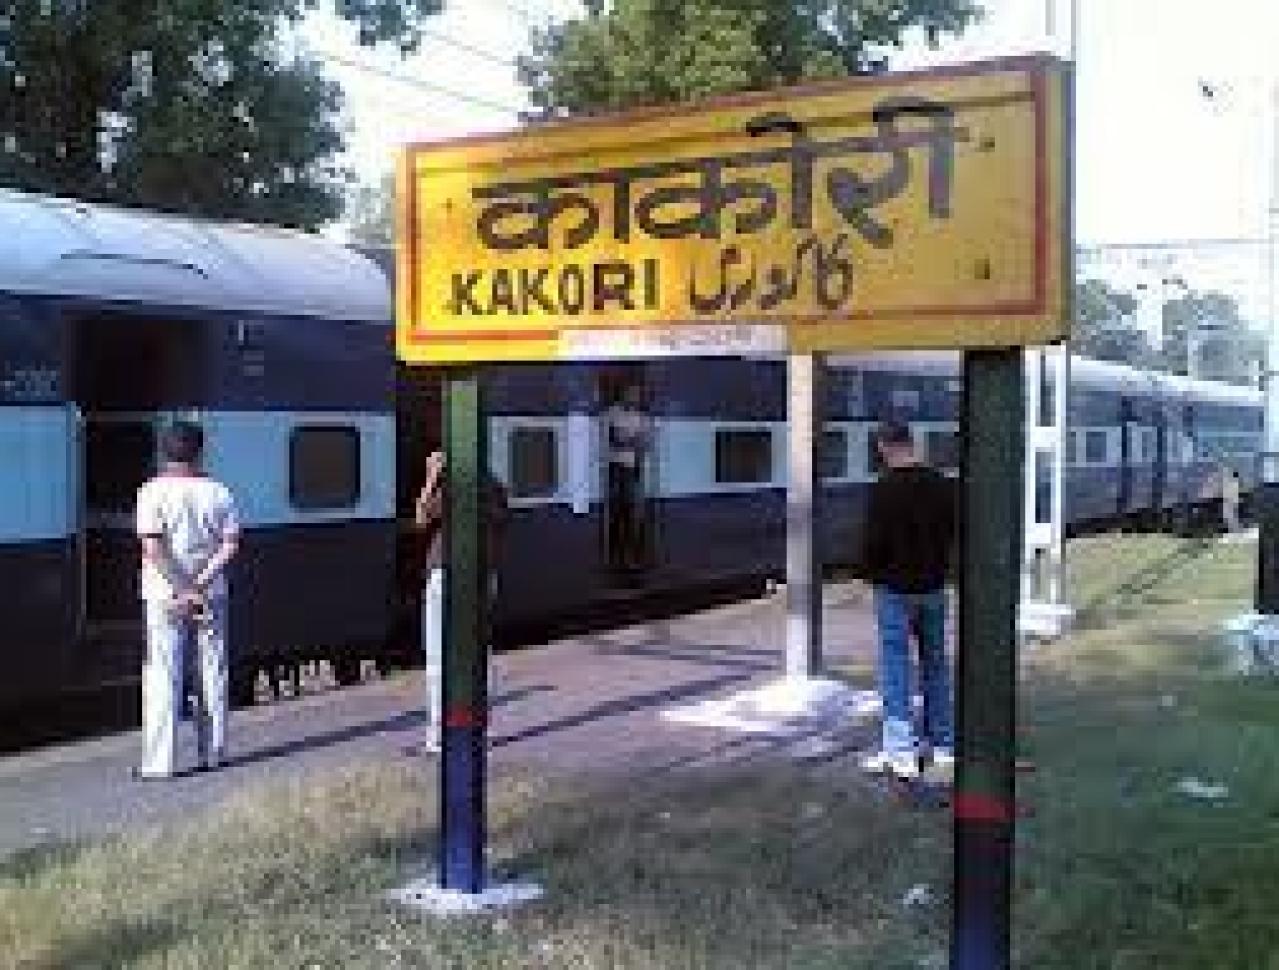 The railway station at Kakori.